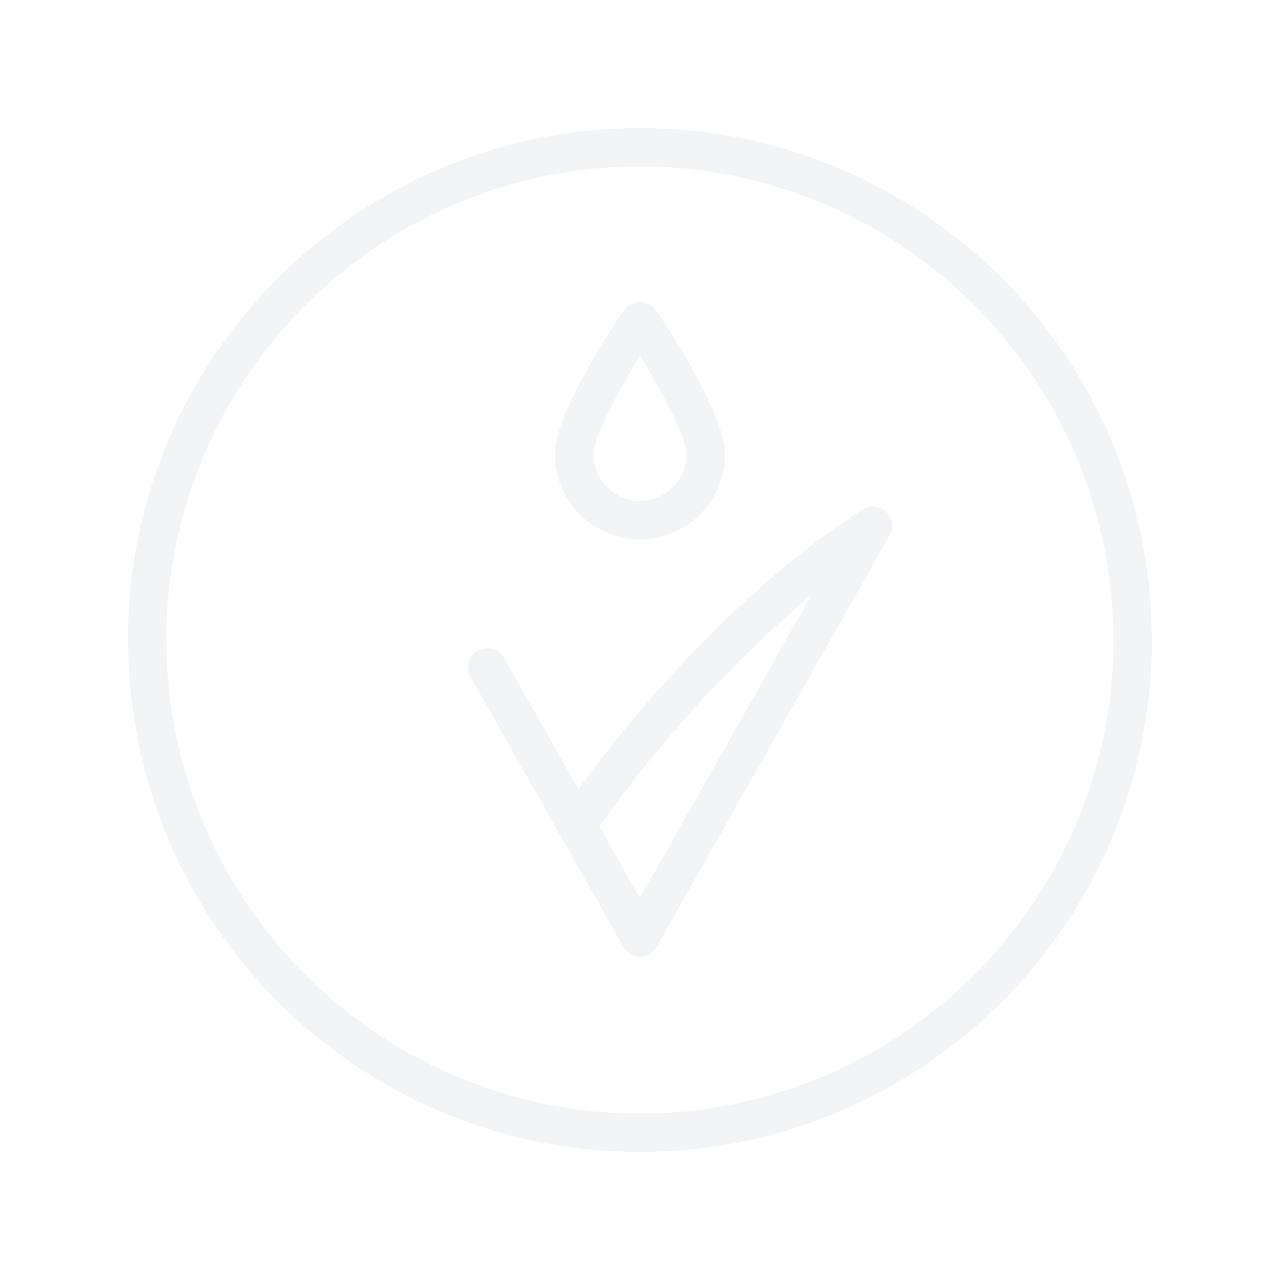 CLARINS Extra-Firming Night Cream (Dry Skin) 50ml